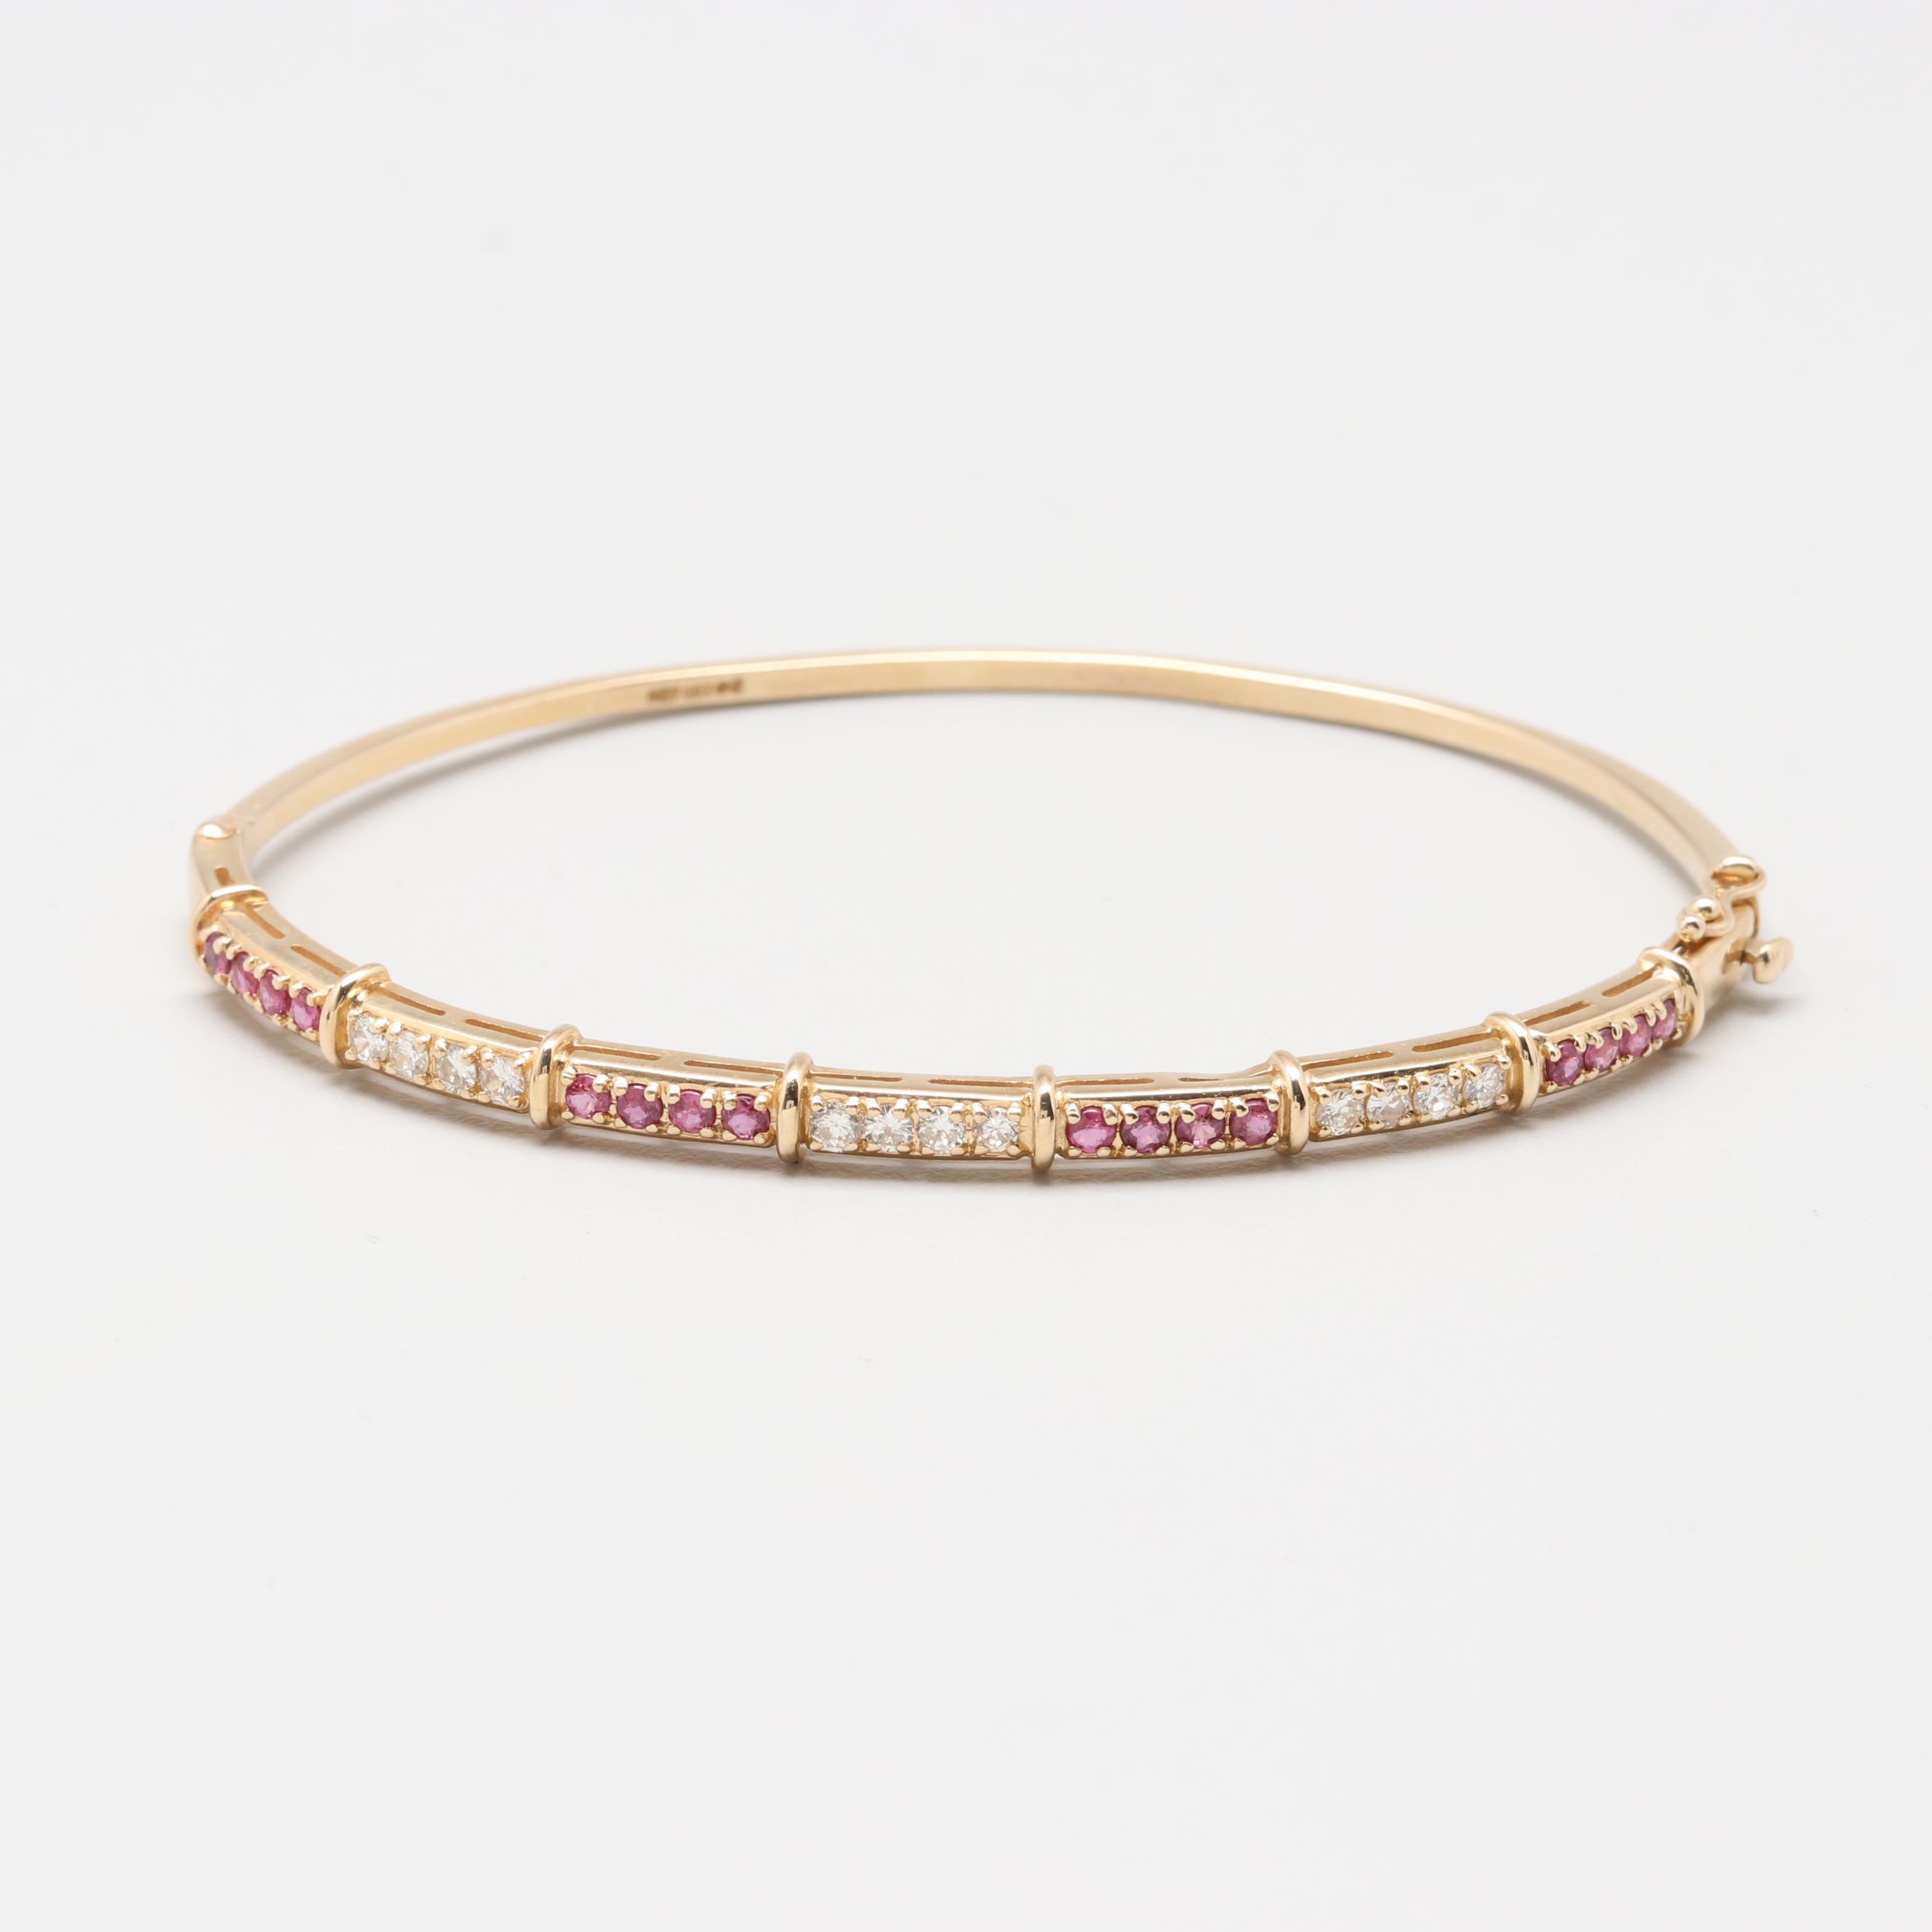 14K Yellow Gold Ruby and Diamond Hinged Bangle Bracelet